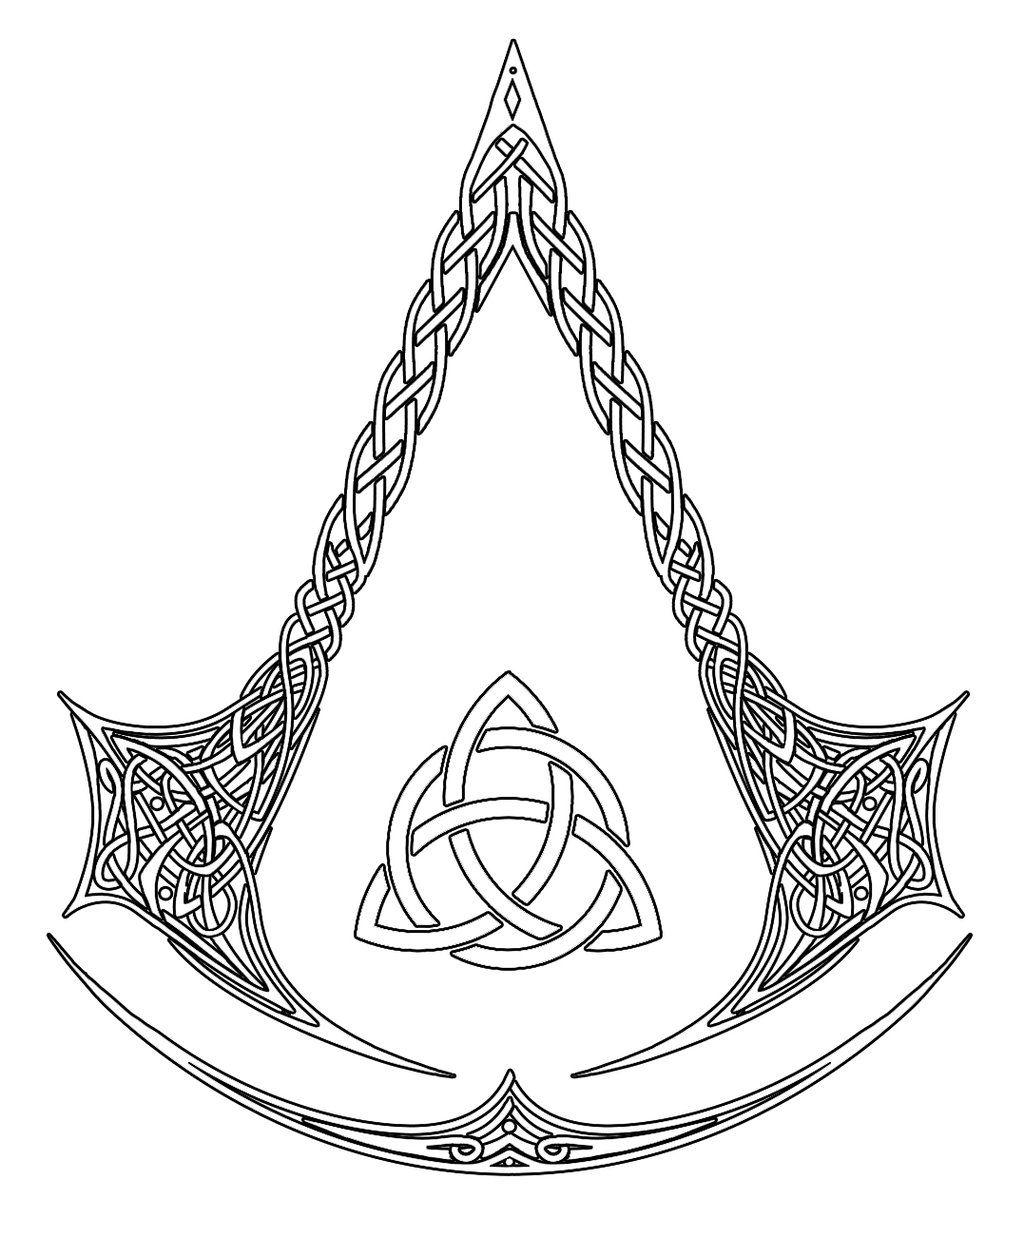 Assassin/'s Creed Unity Decal Sticker Bedroom Vinyl Kids Art Emblem